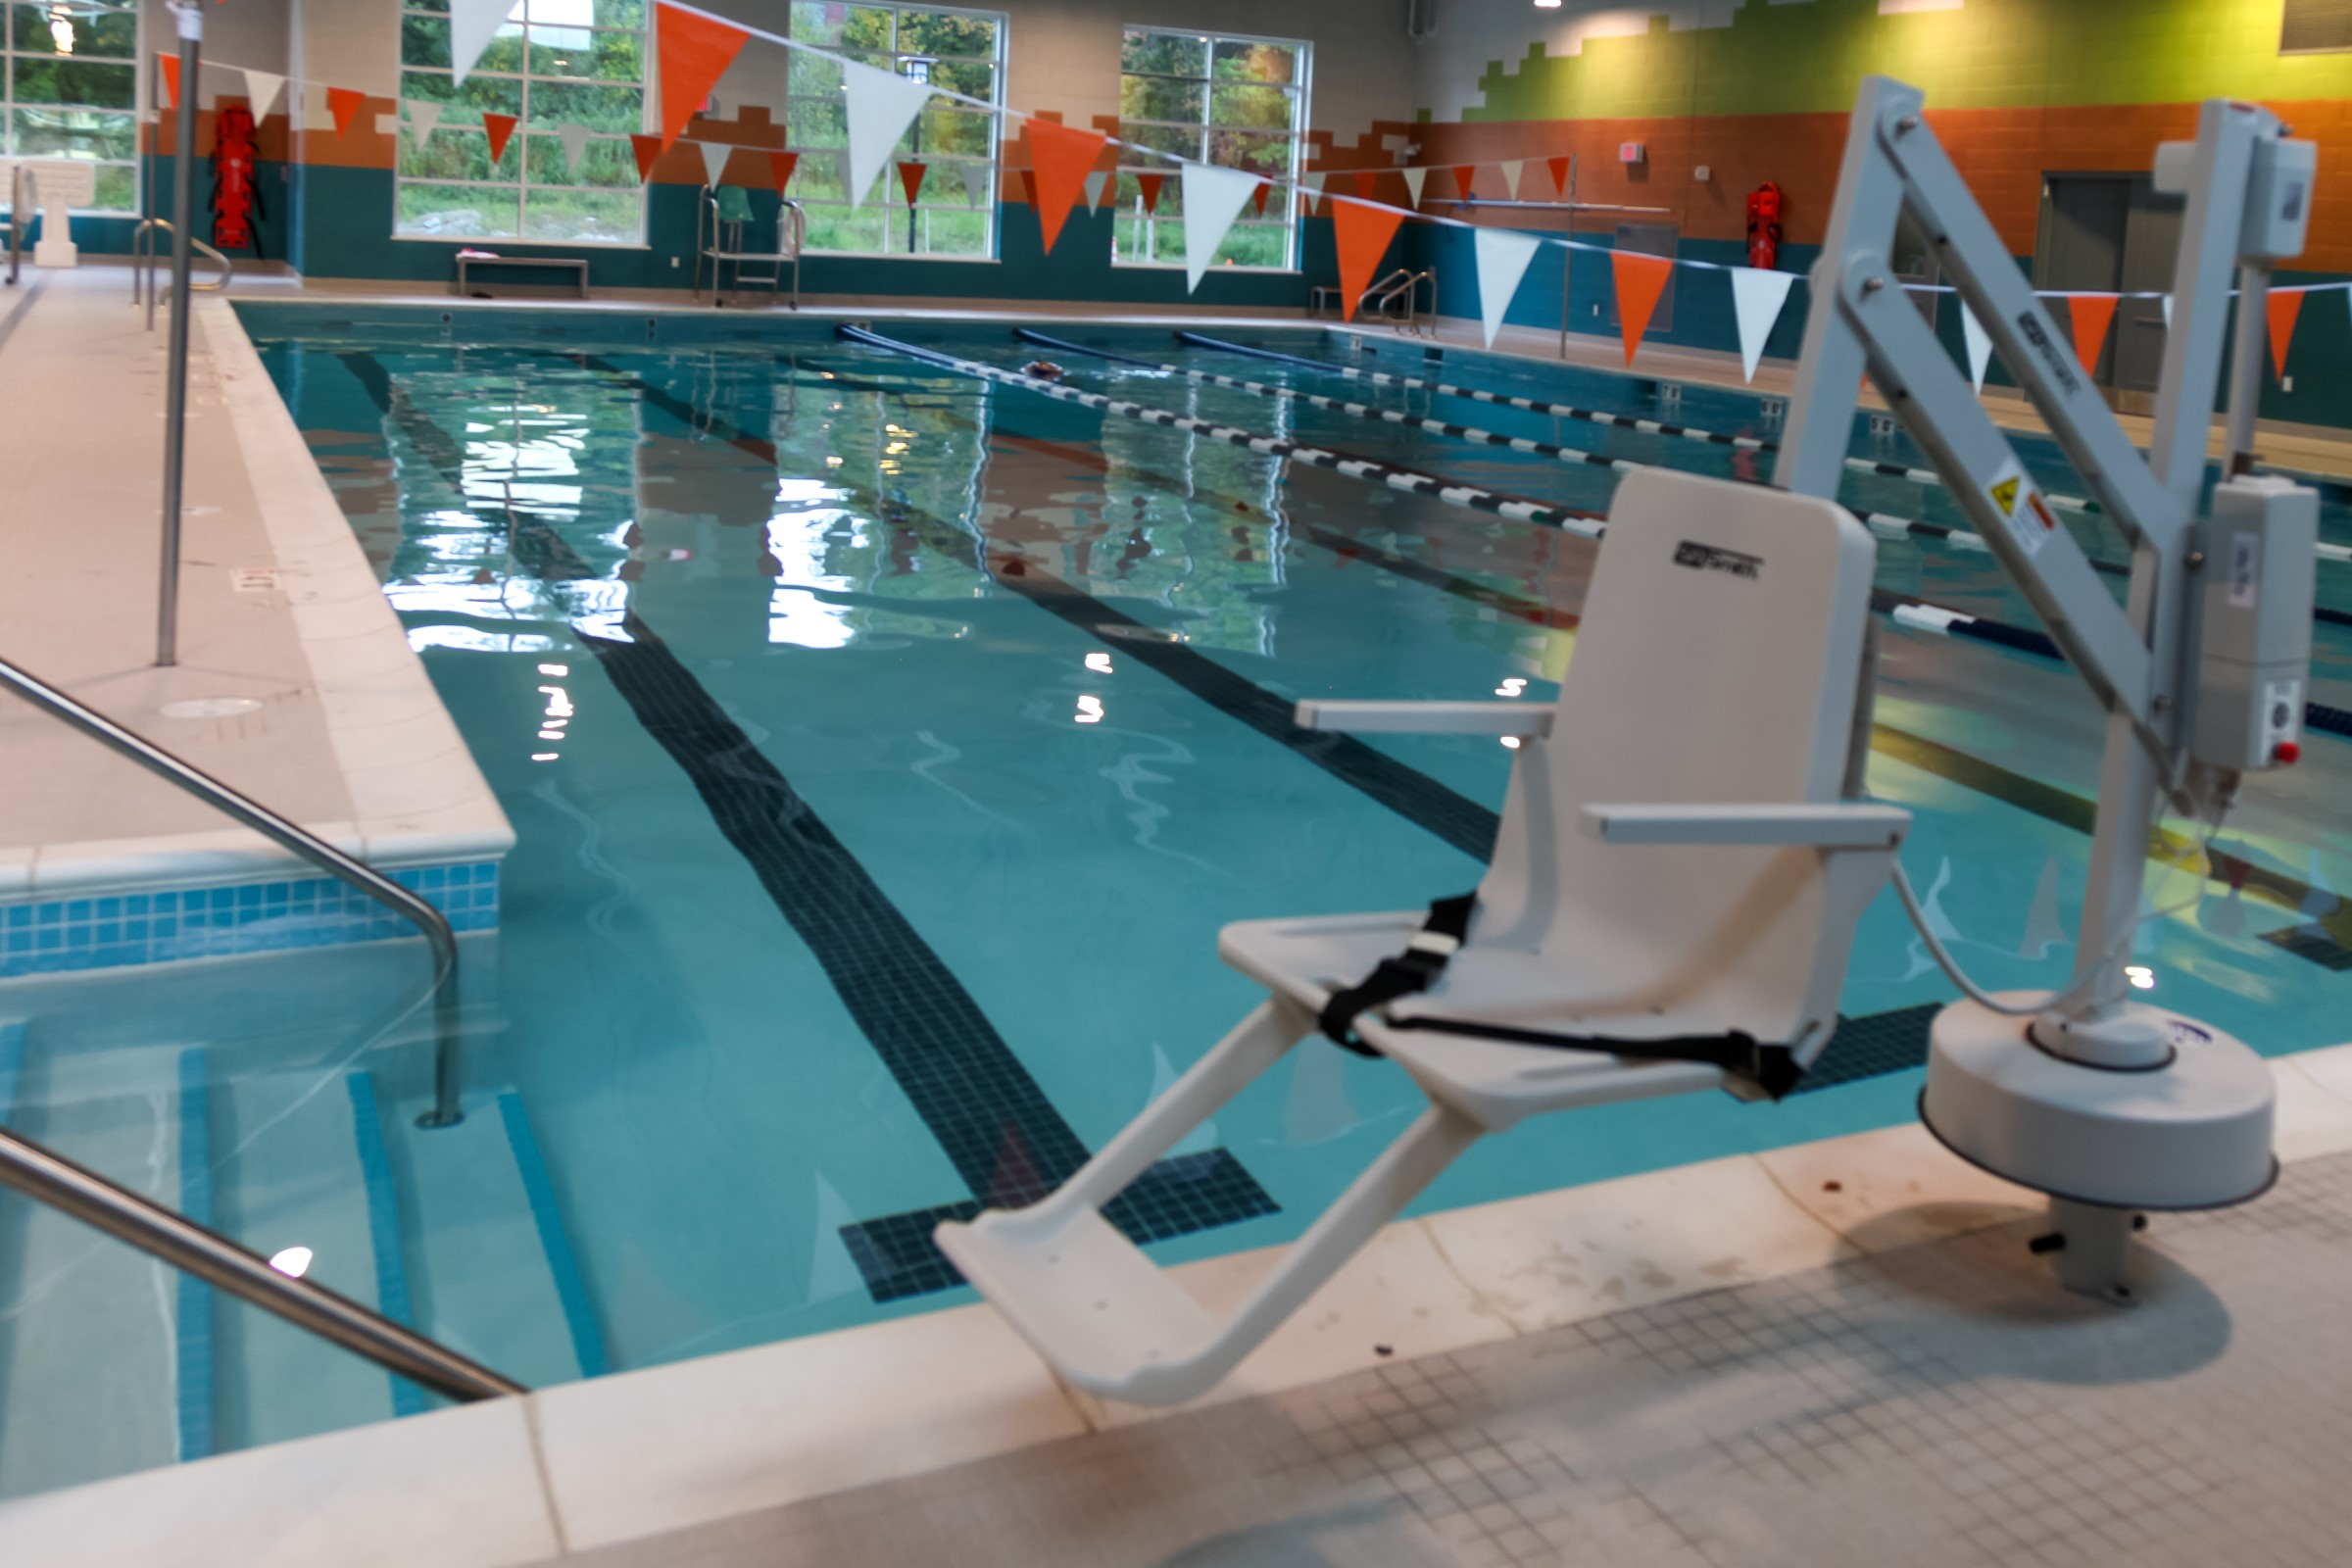 Newtown Community Center Pools